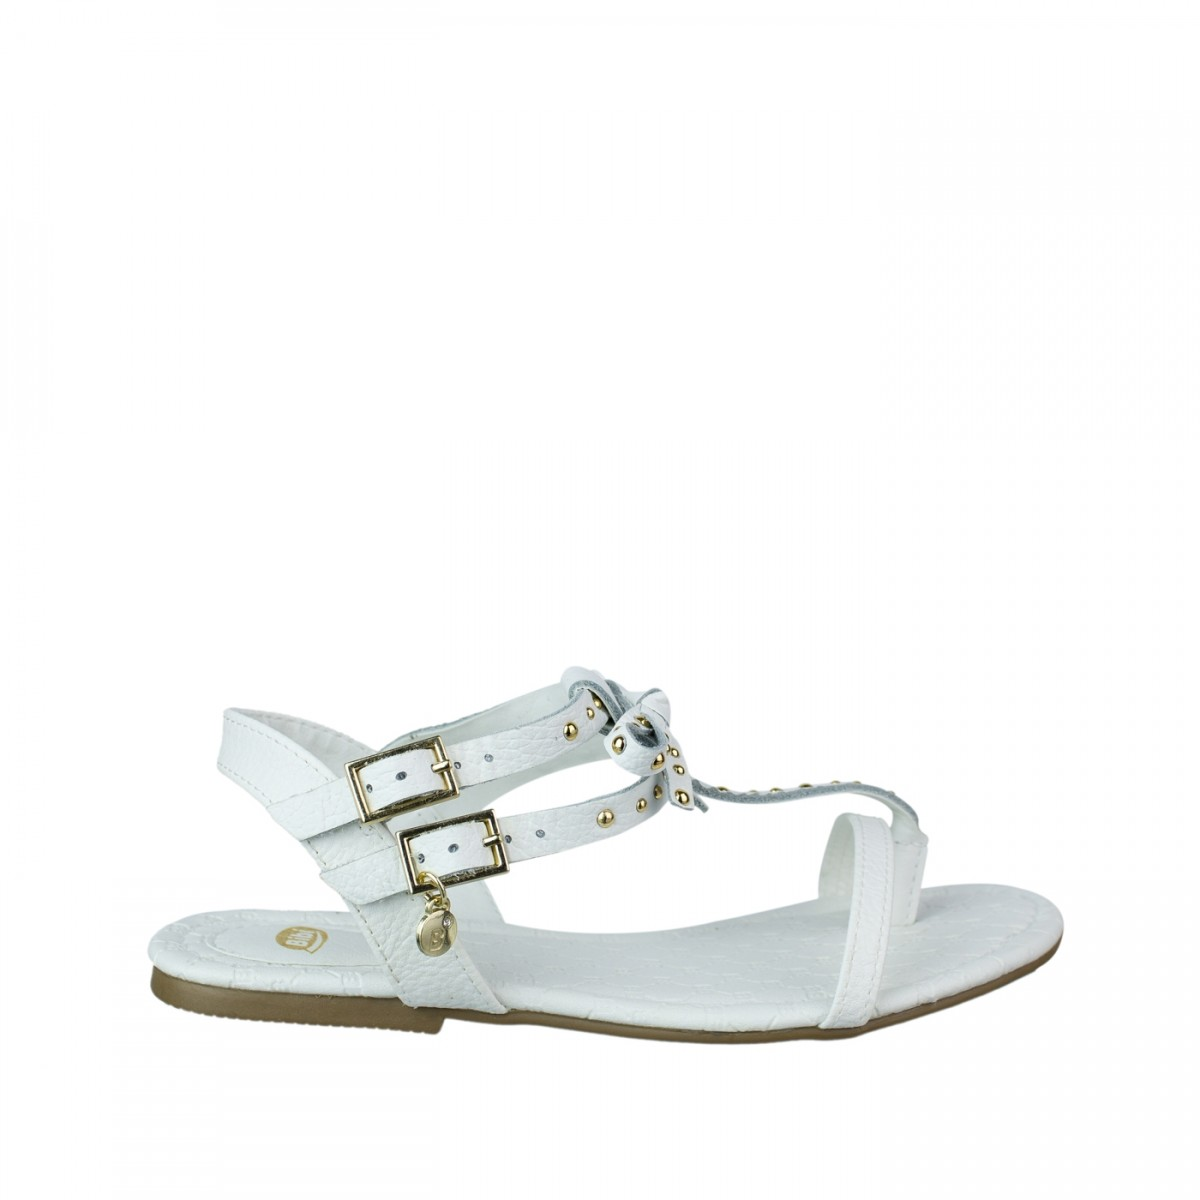 e079aba8f8 Bizz Store - Sandália Infantil Feminina Bibi Confetti Branca